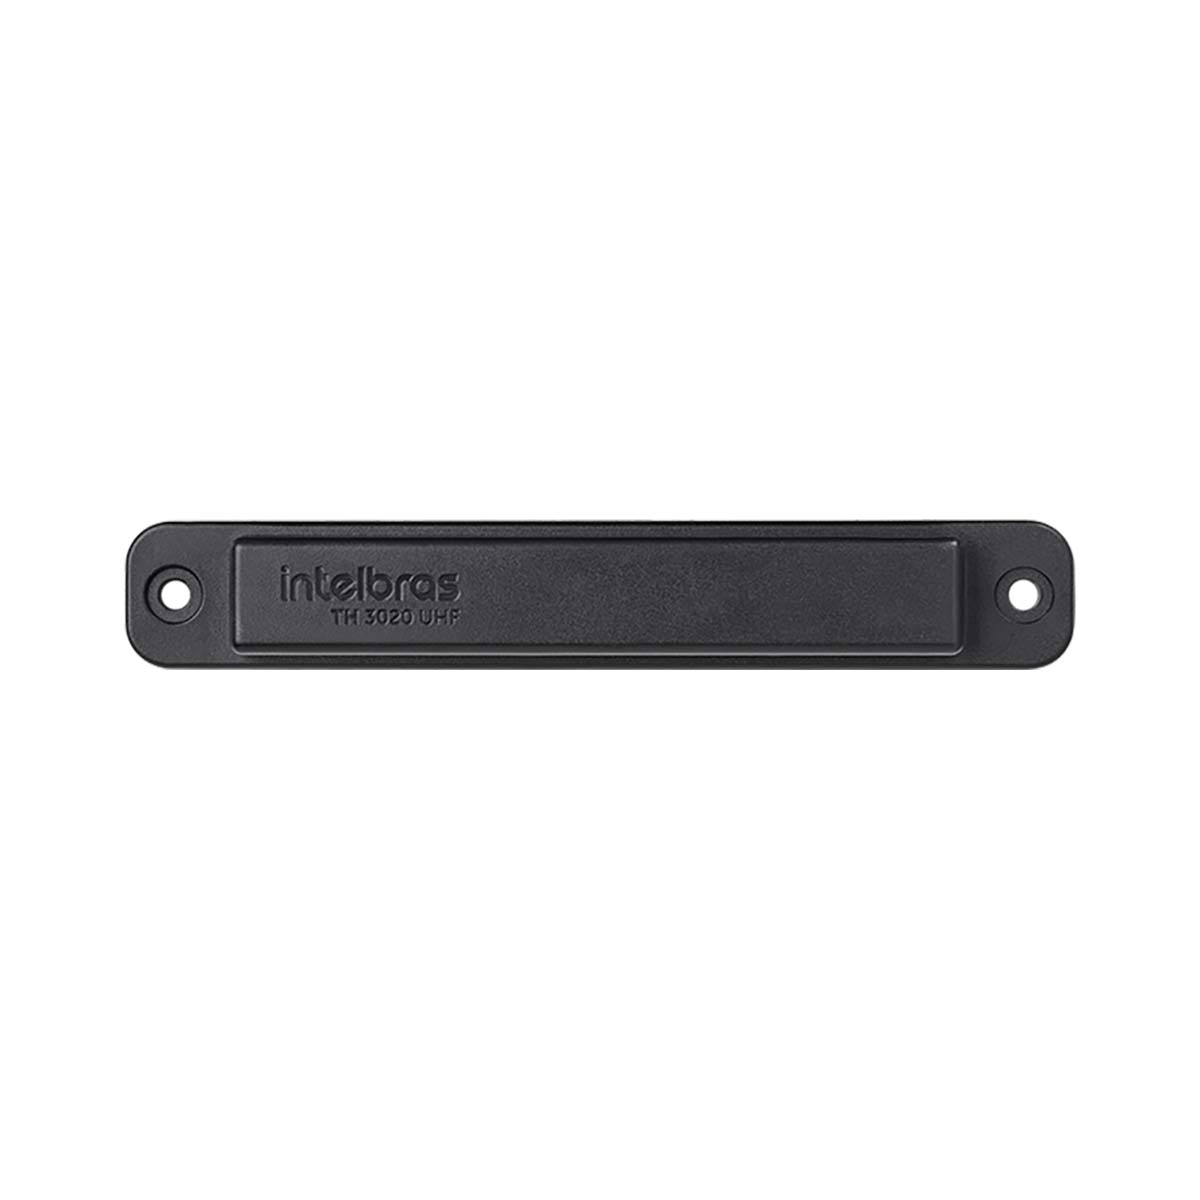 Kit 03 Etiqueta Veicular Intelbras Rfid 900mhz Th 3020 Uhf